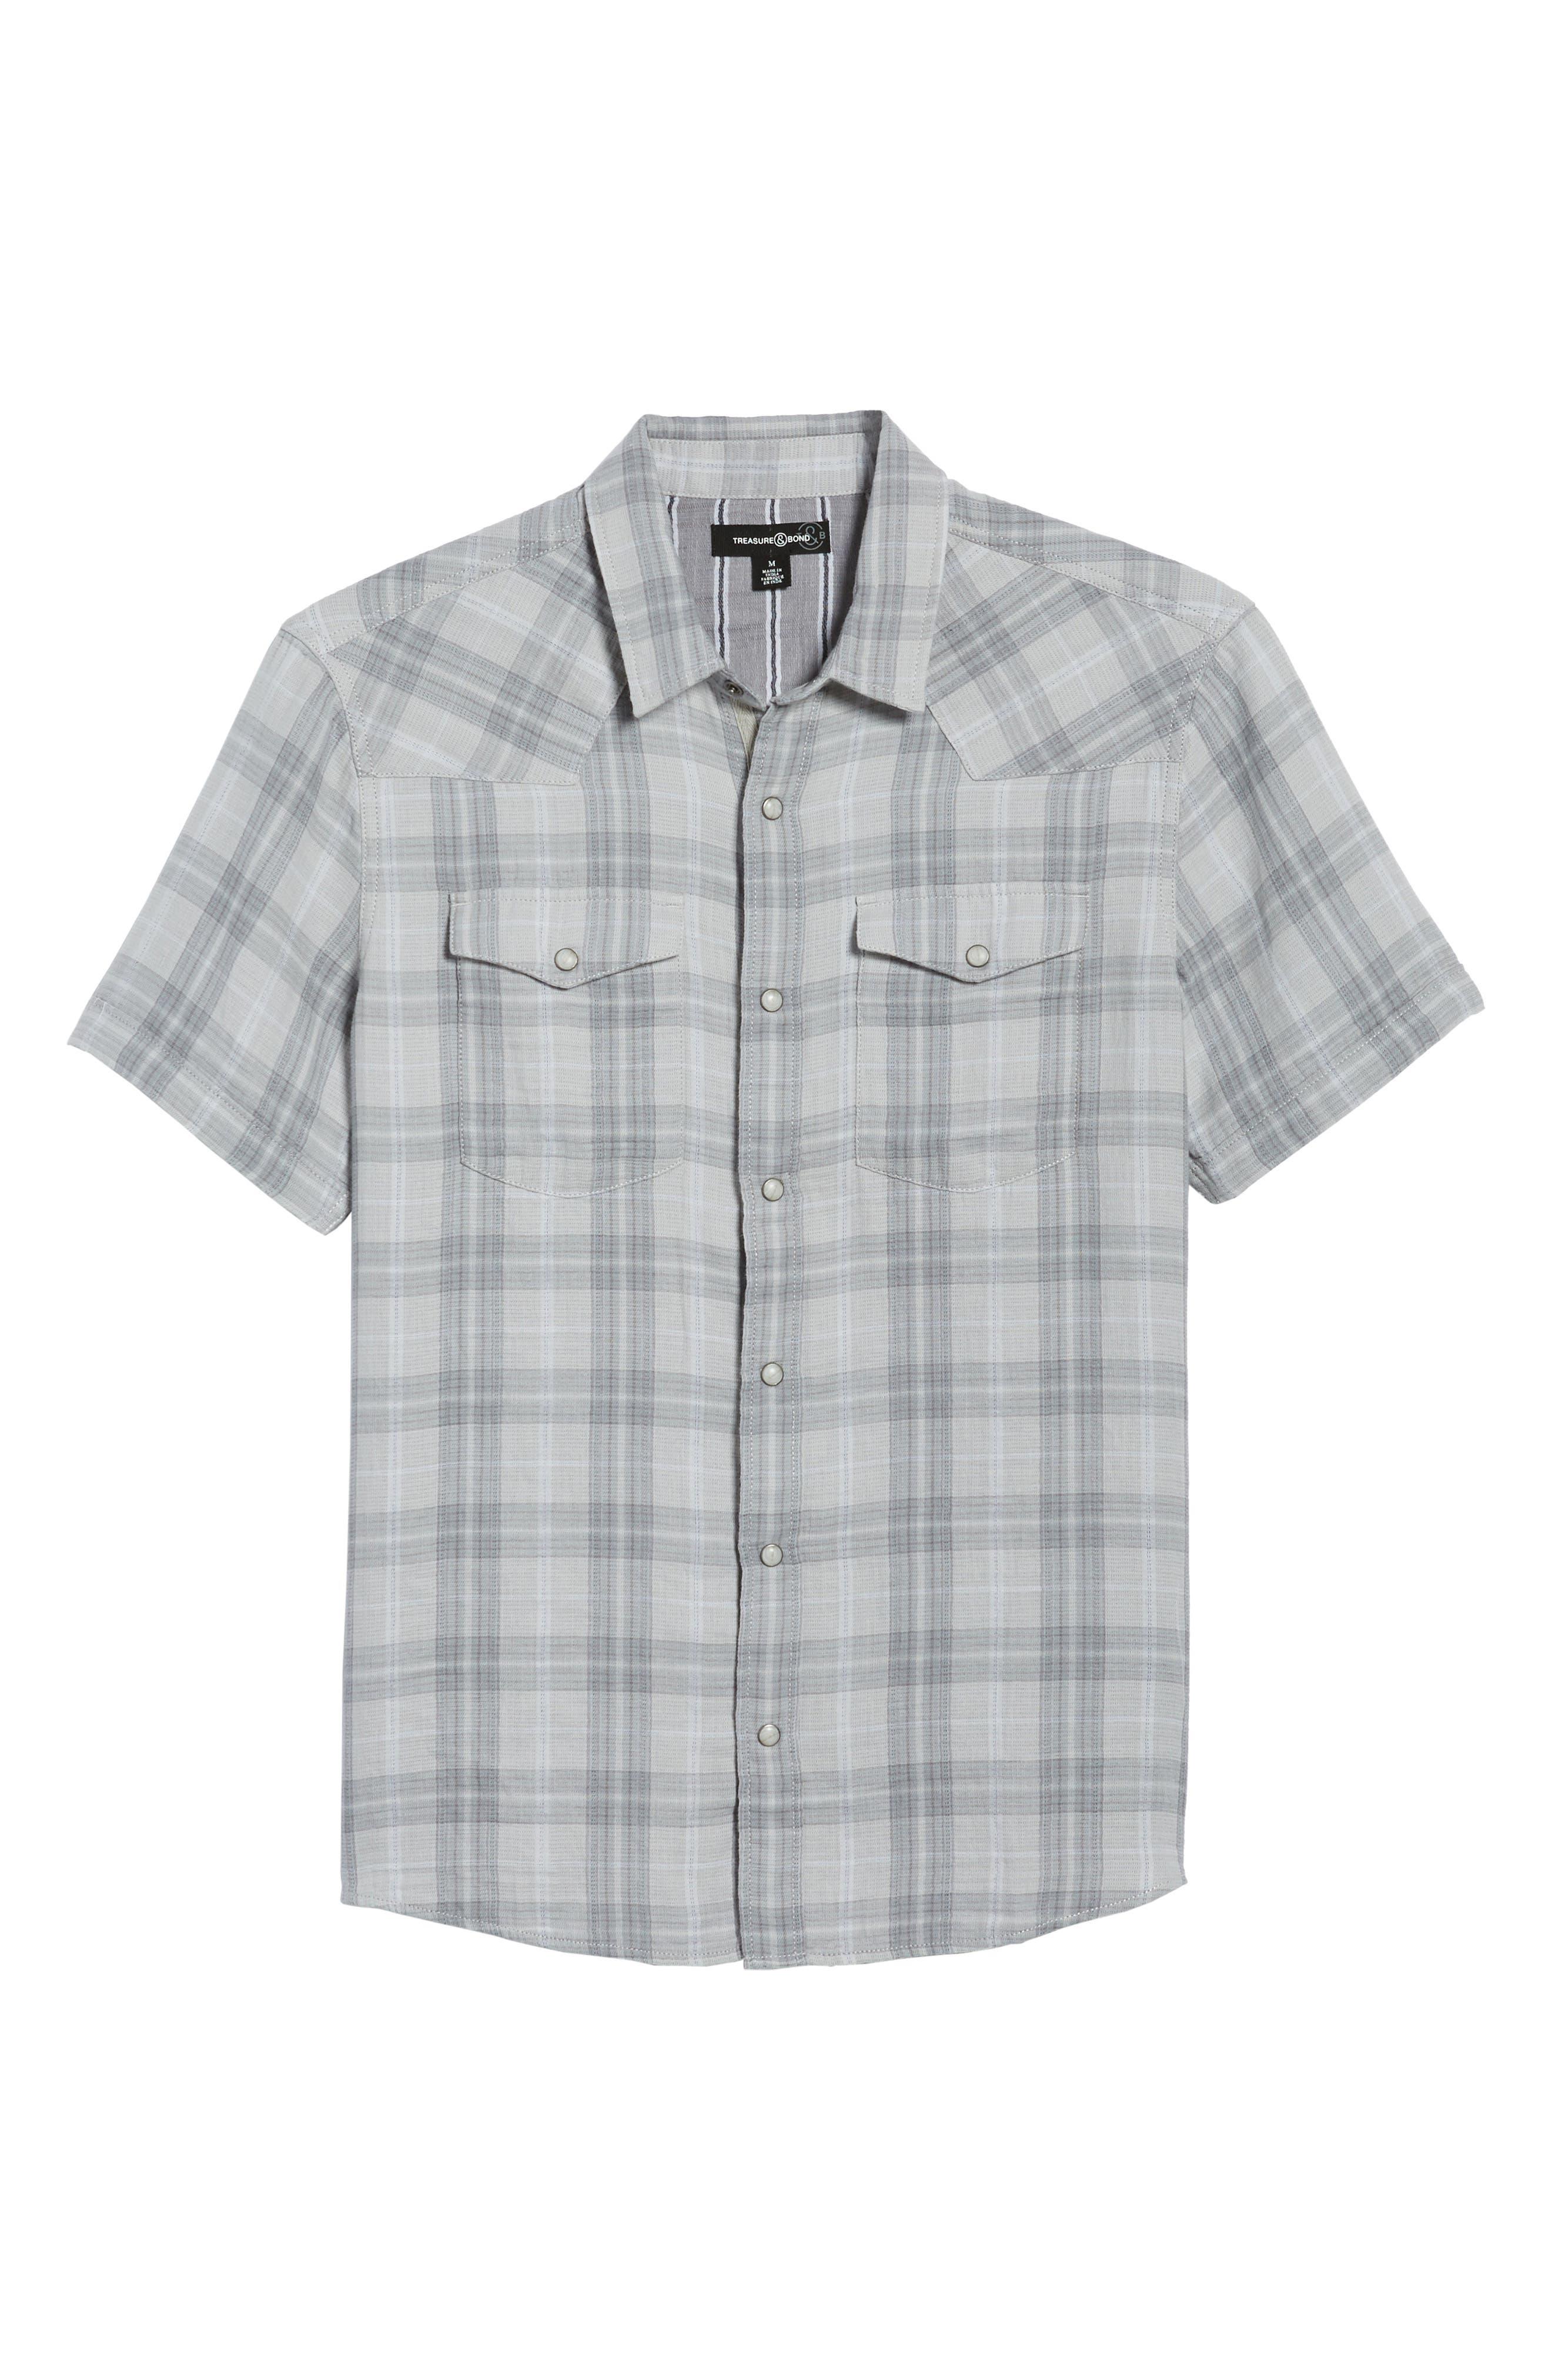 Plaid Short Sleeve Sport Shirt,                             Alternate thumbnail 5, color,                             Grey Sleet Plaid Duofold